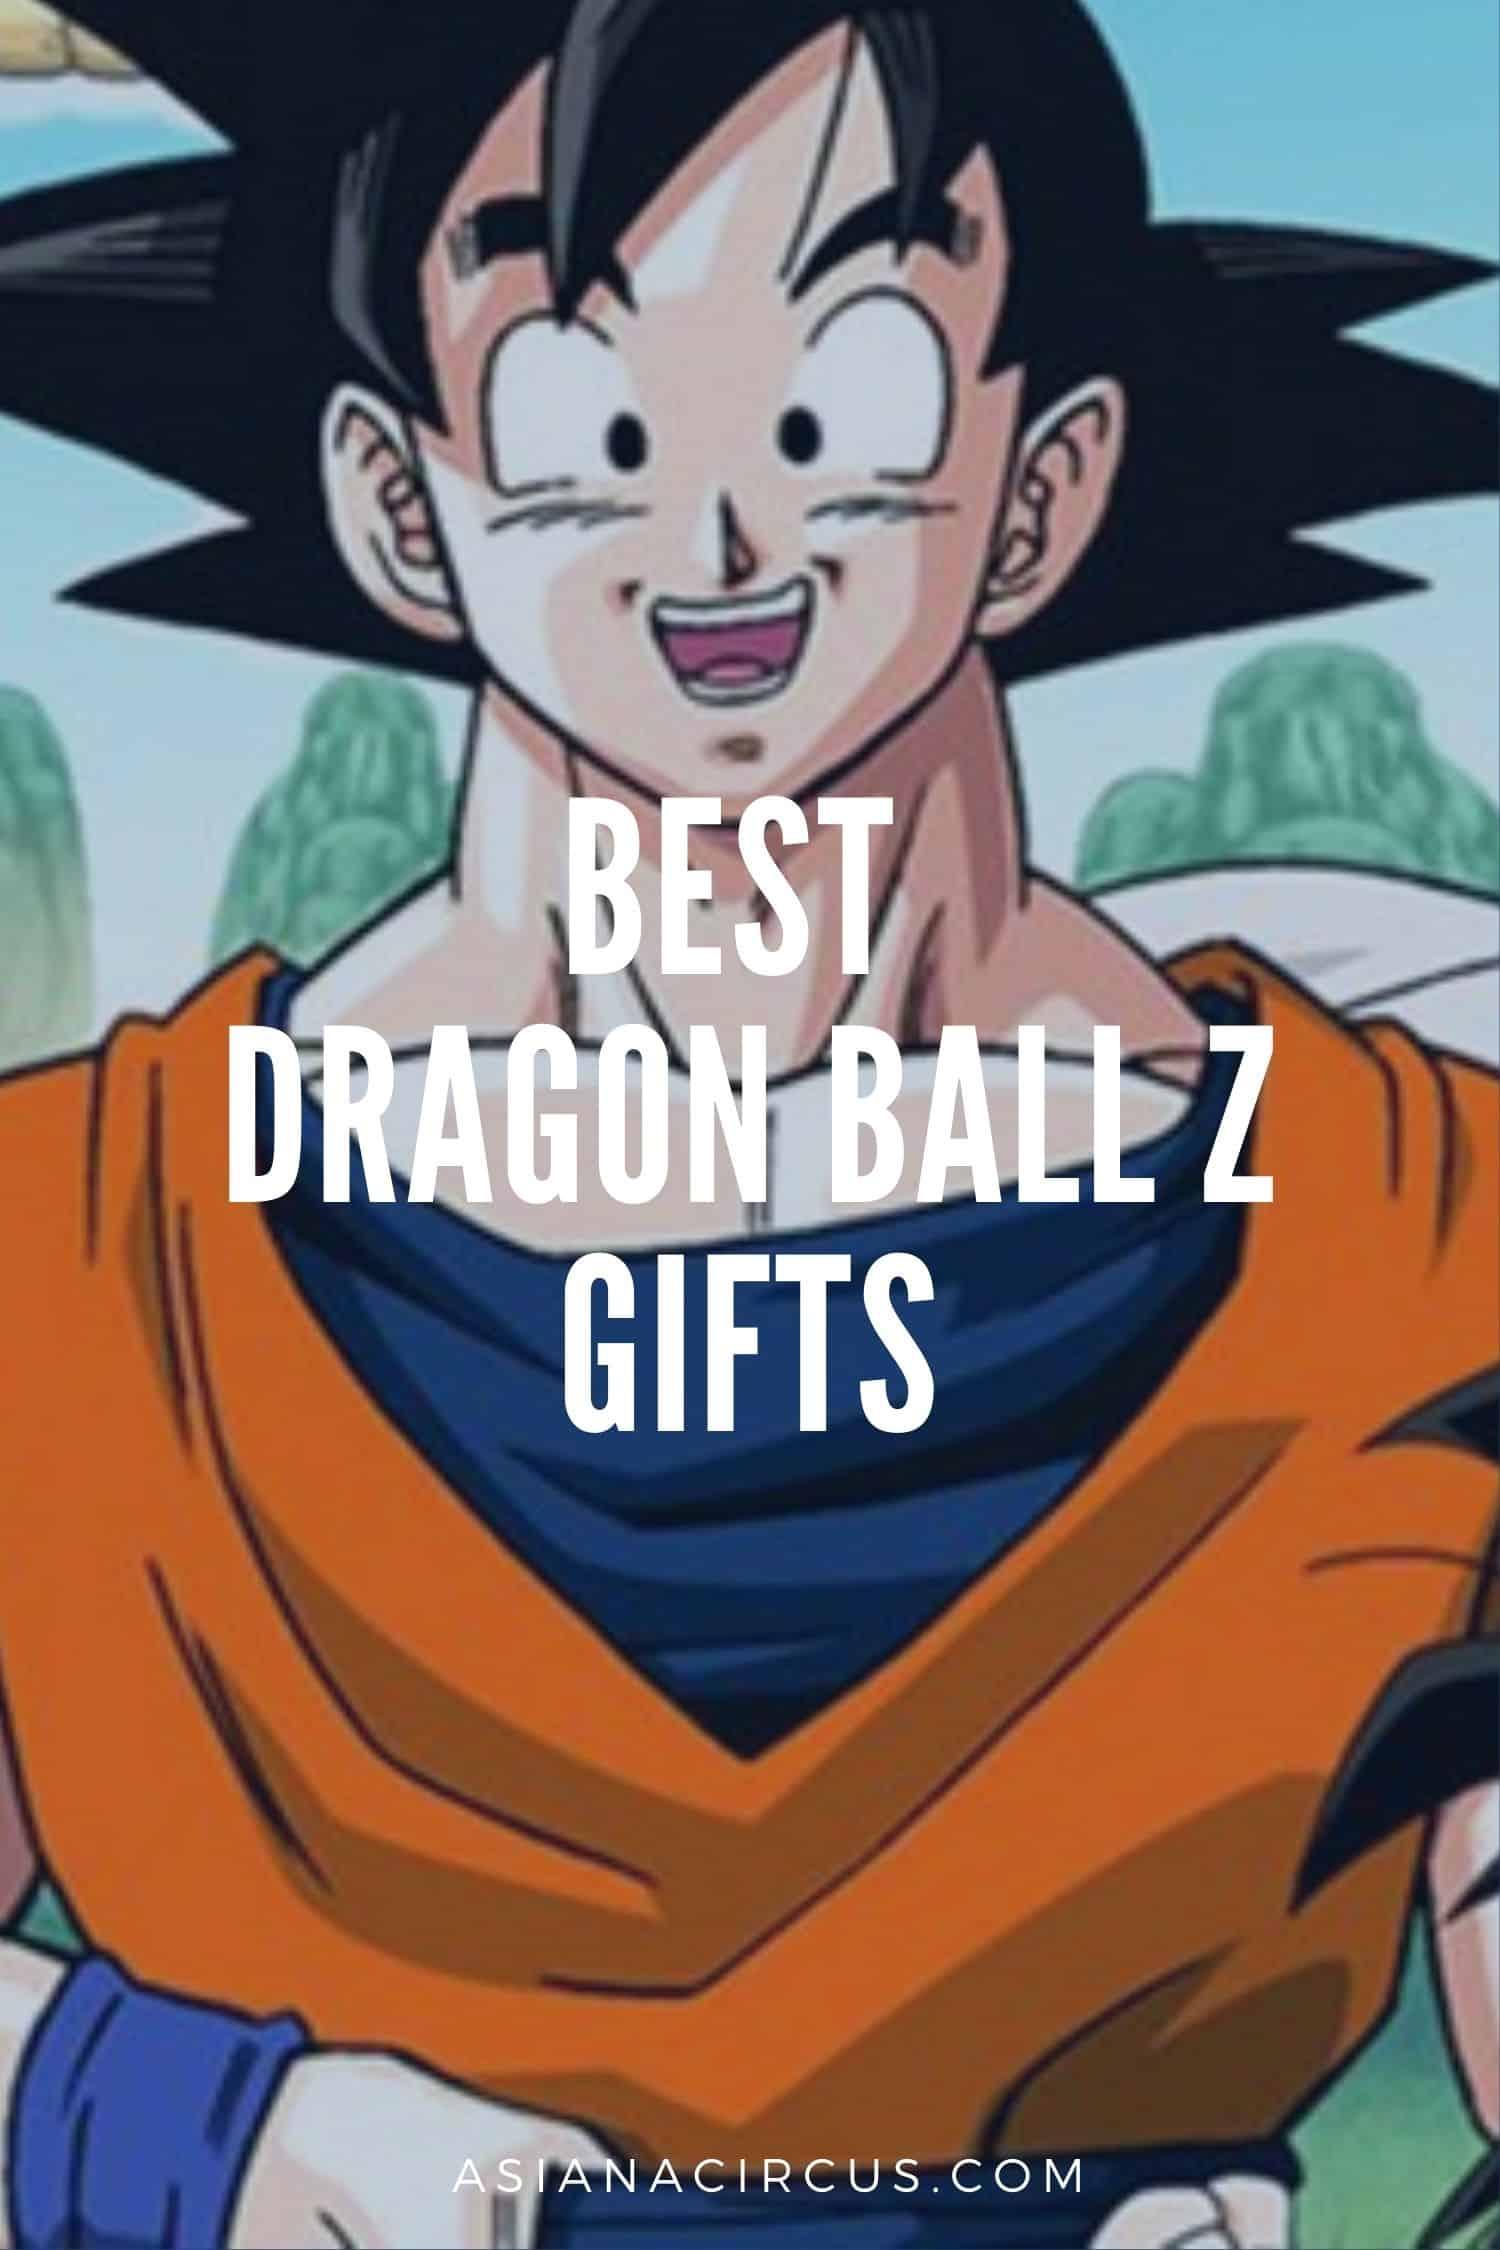 Best Dragon Ball Z Gifts (1)